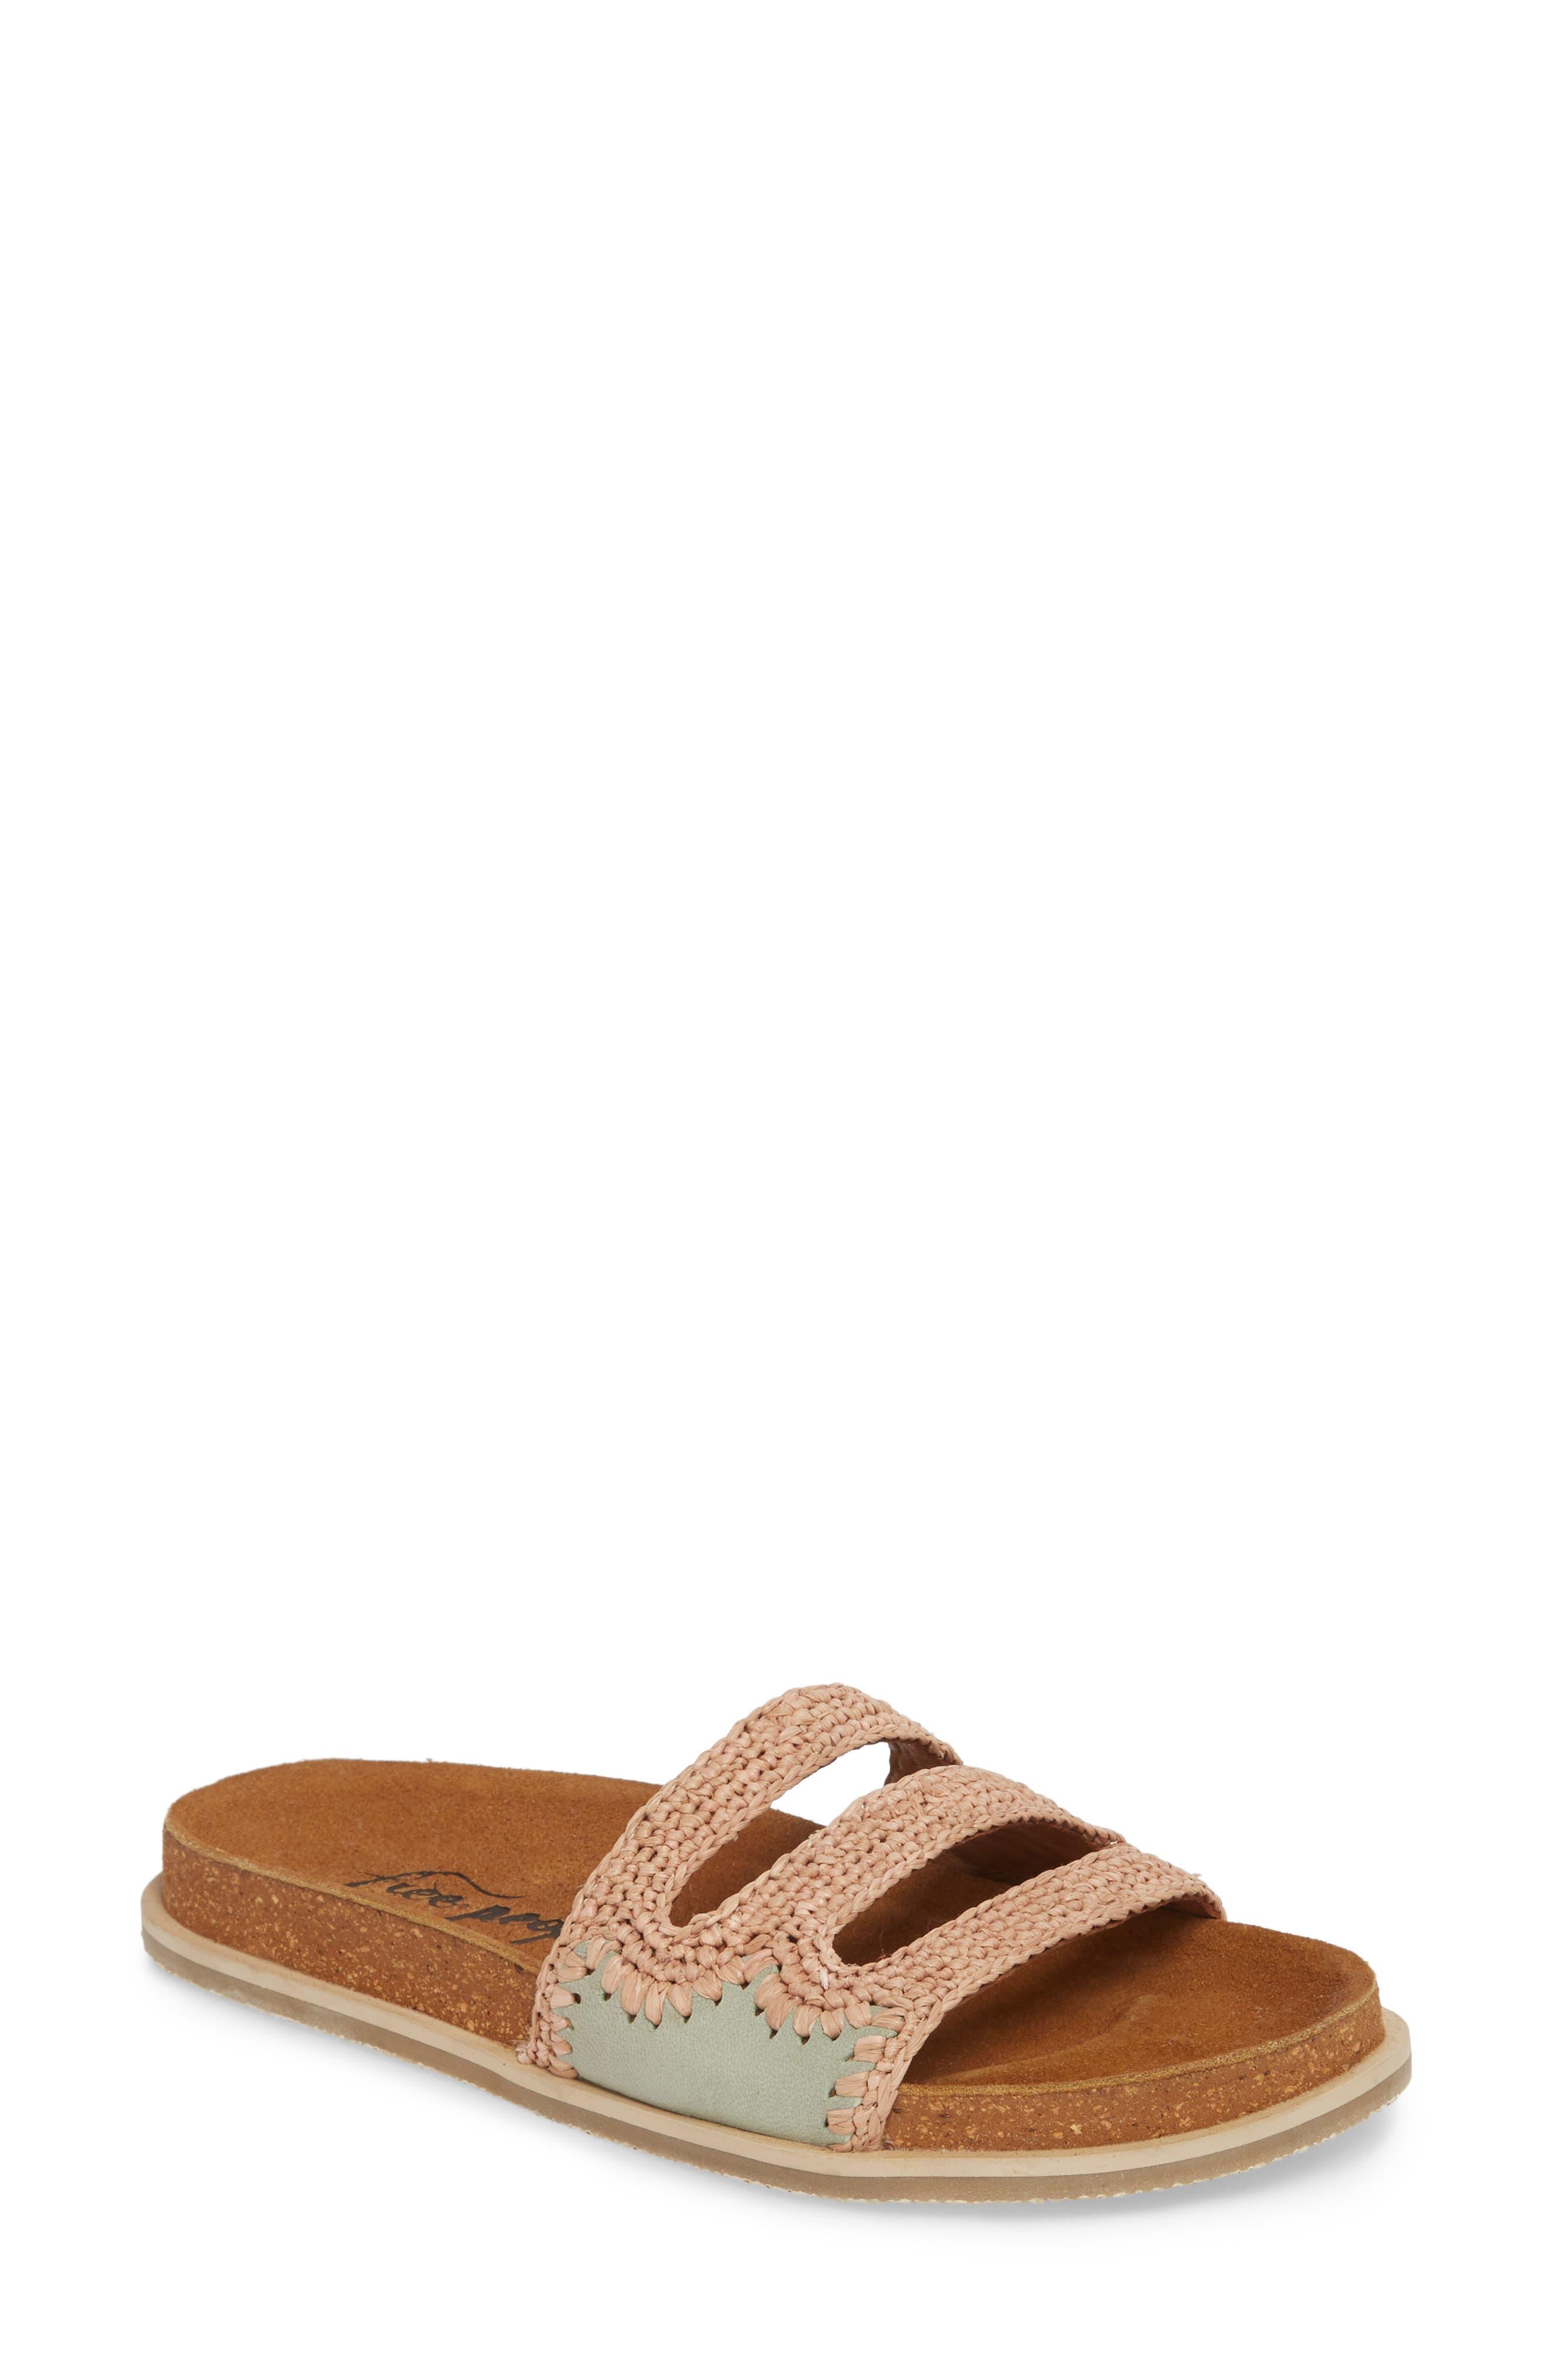 Crete Slide Sandal,                             Main thumbnail 2, color,